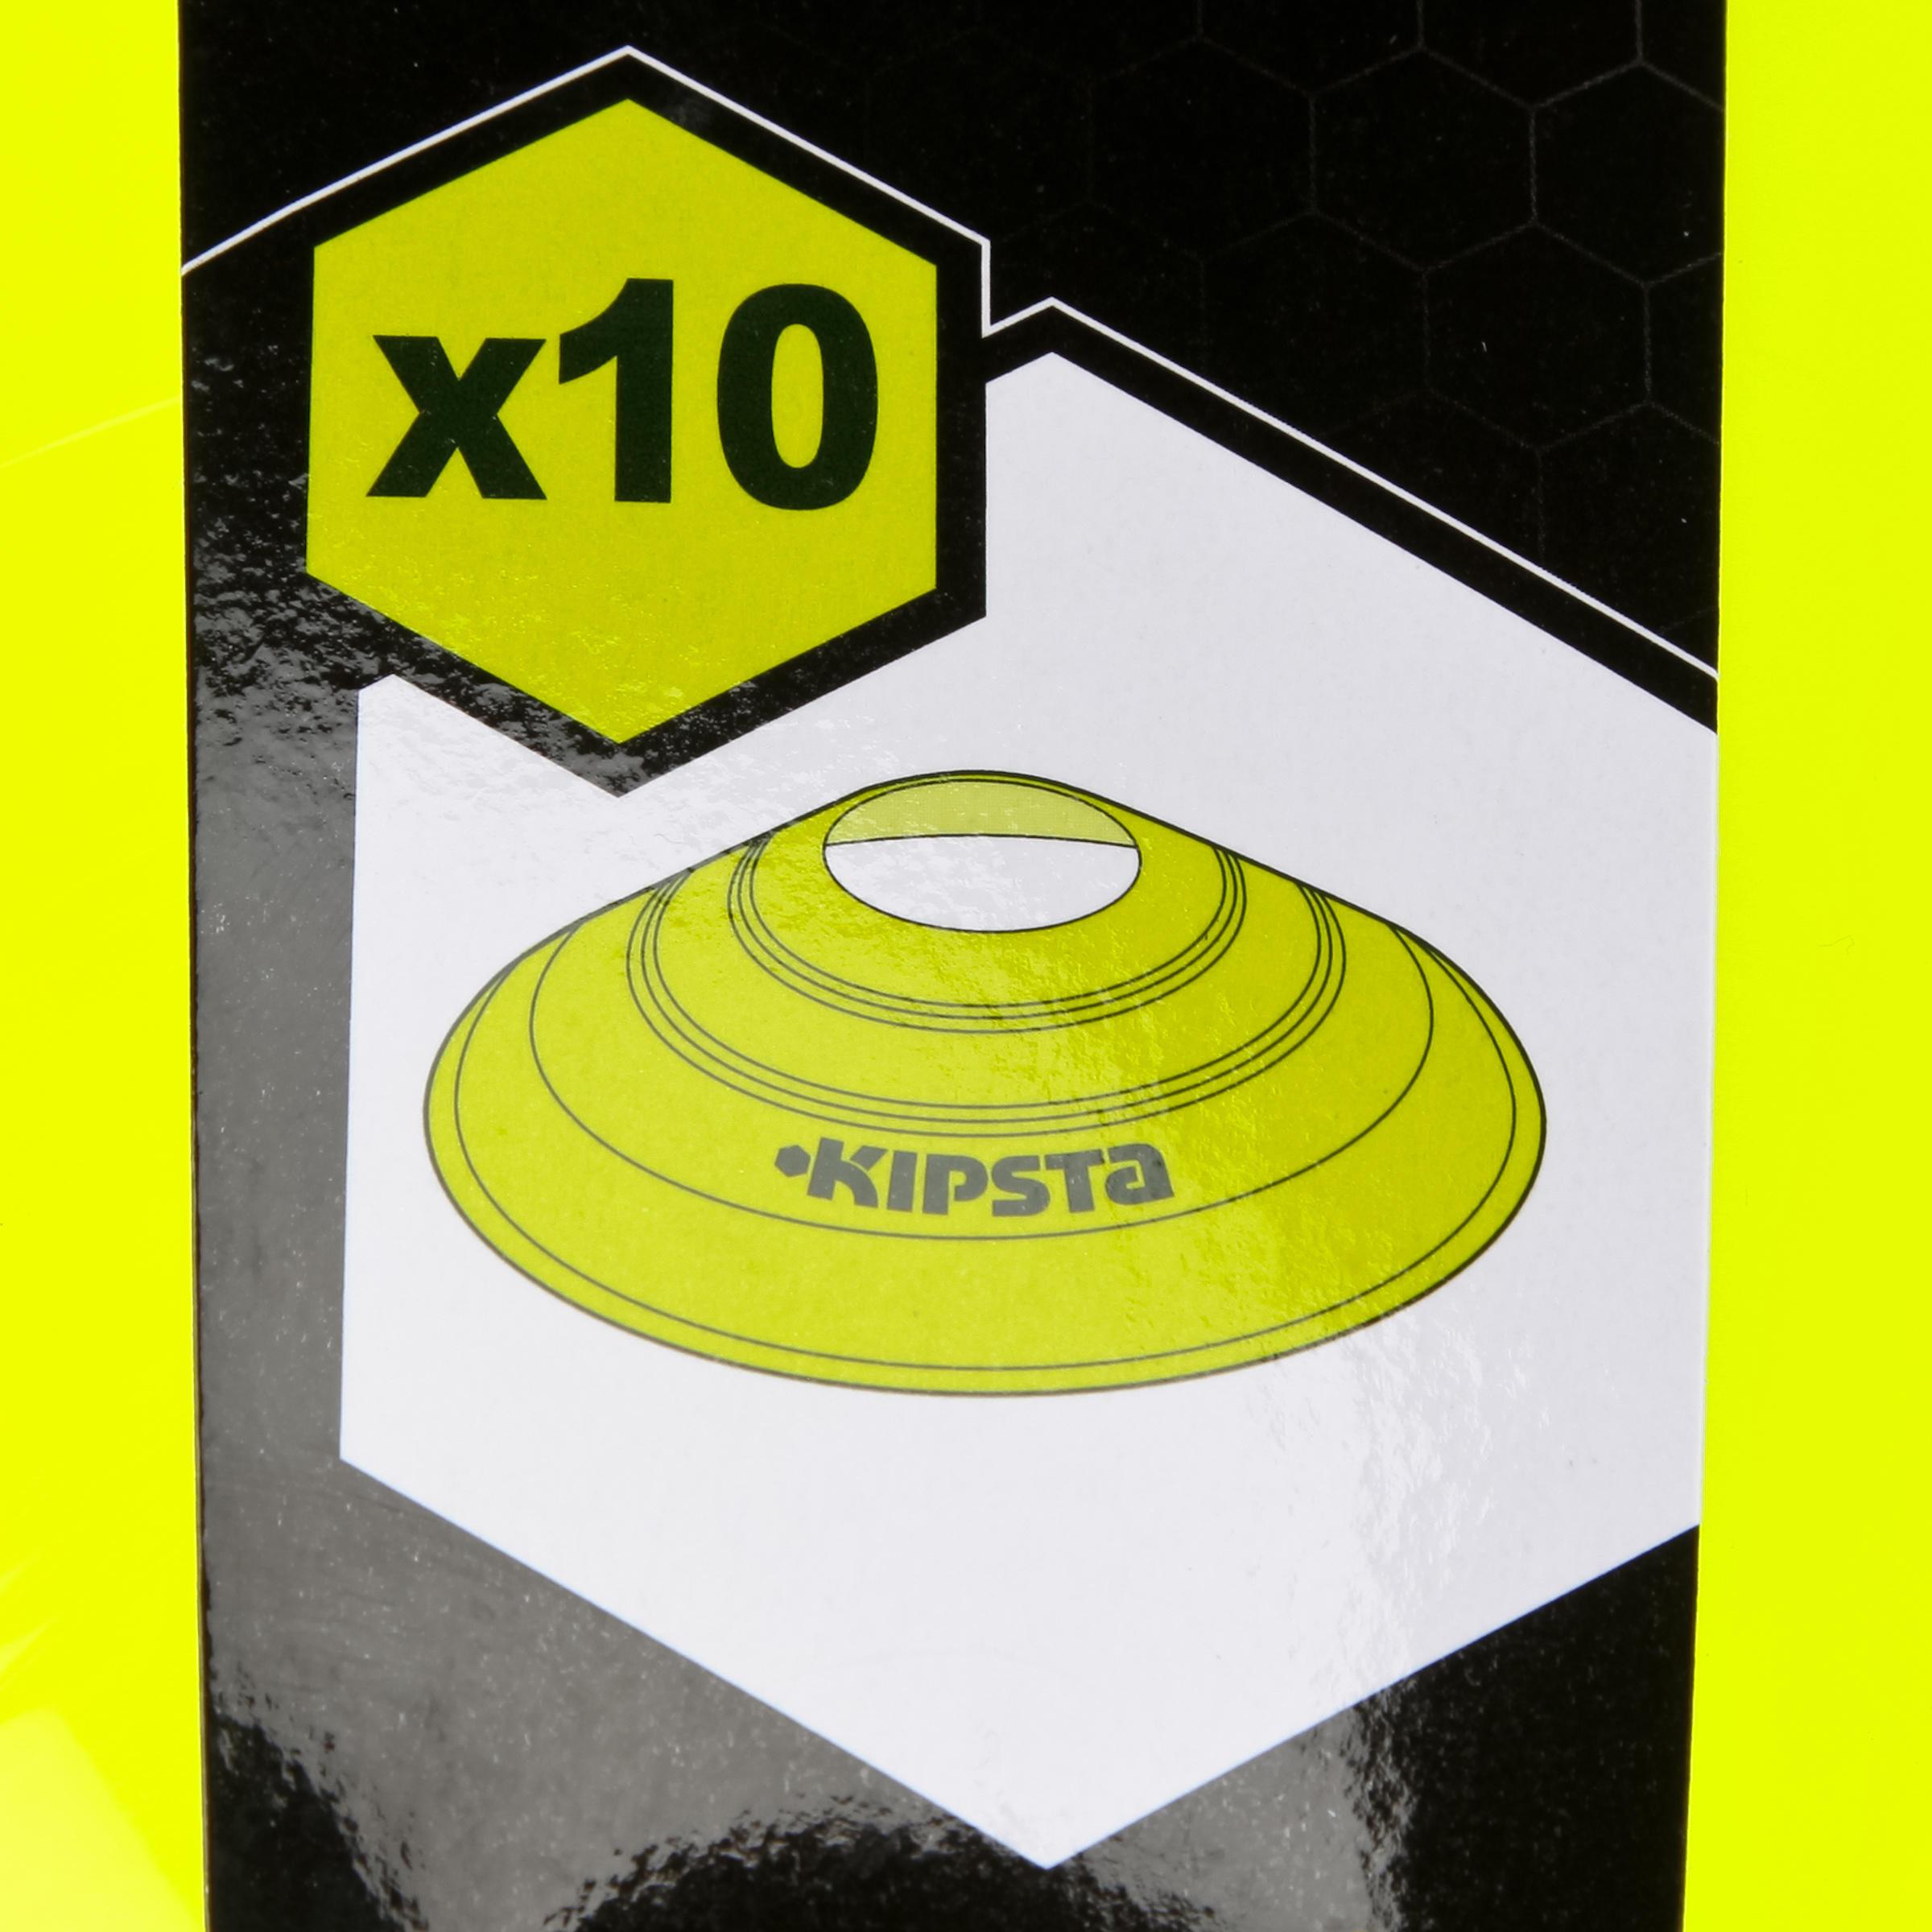 Lot de 10 disques plats jaunes fluos